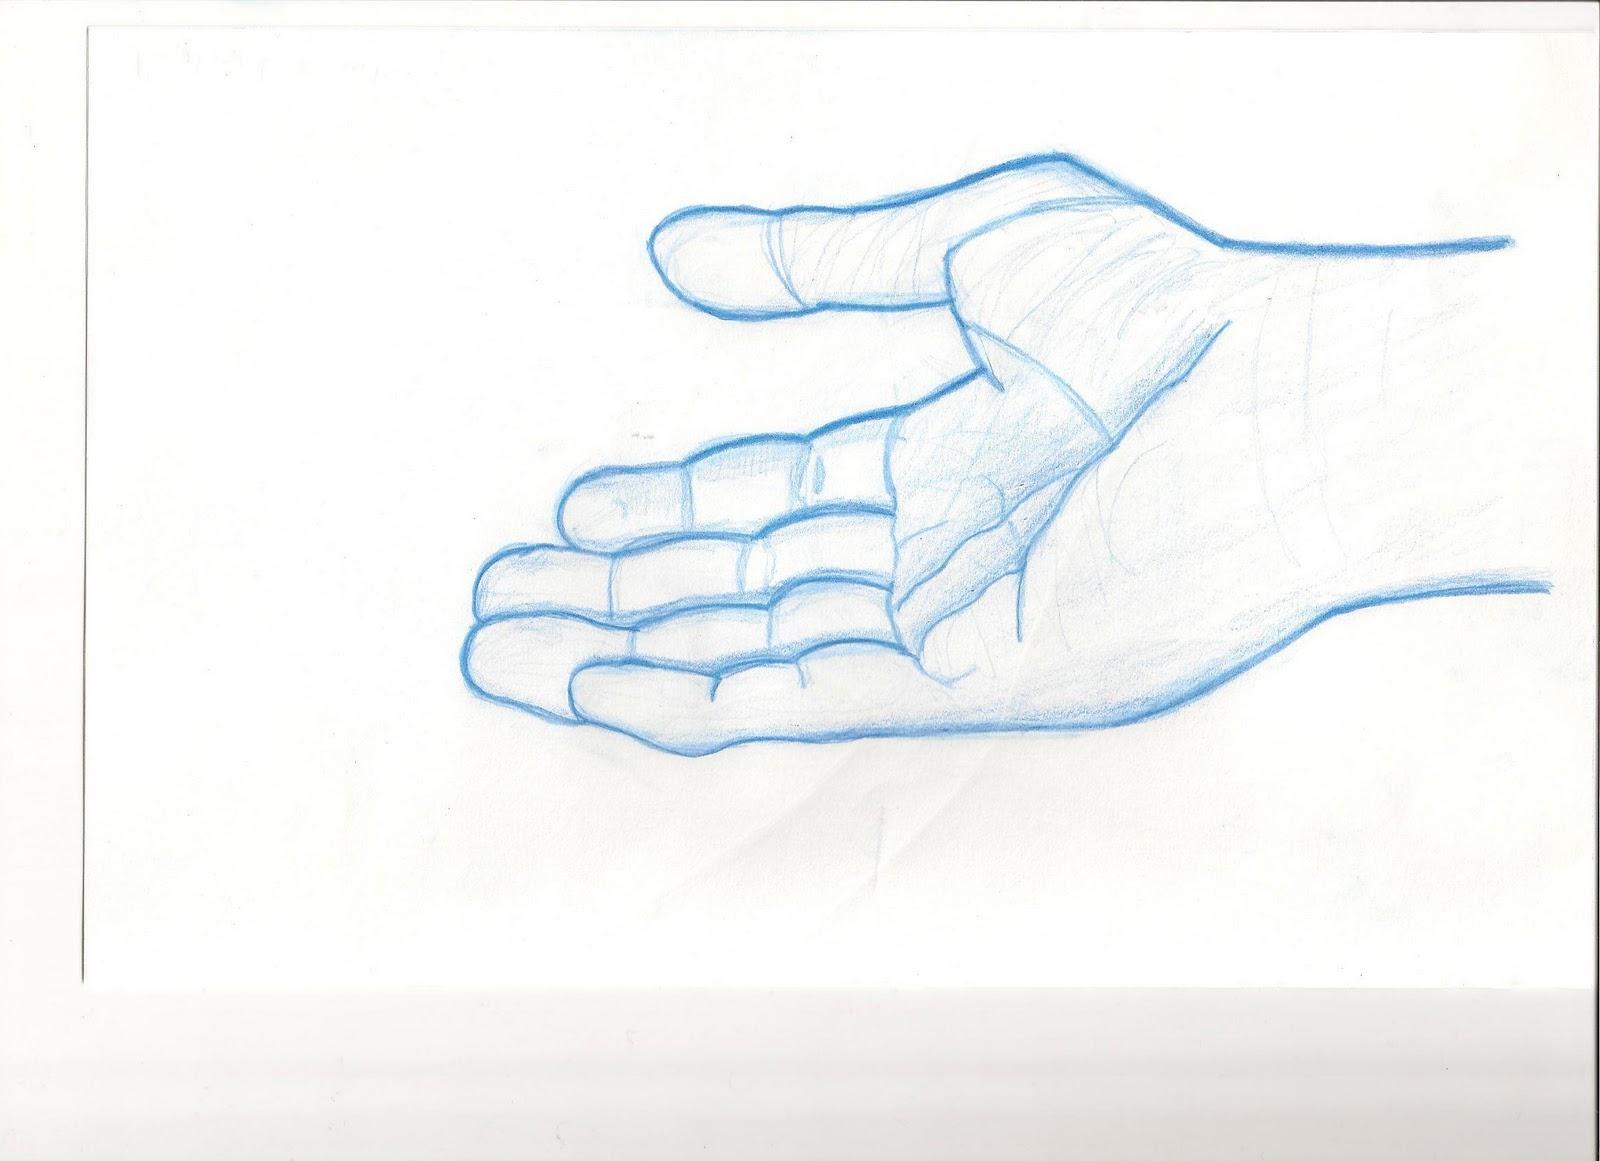 Raphael boucher dessins mains cartoon 3 et de 4 doigts - Dessin de doigt ...